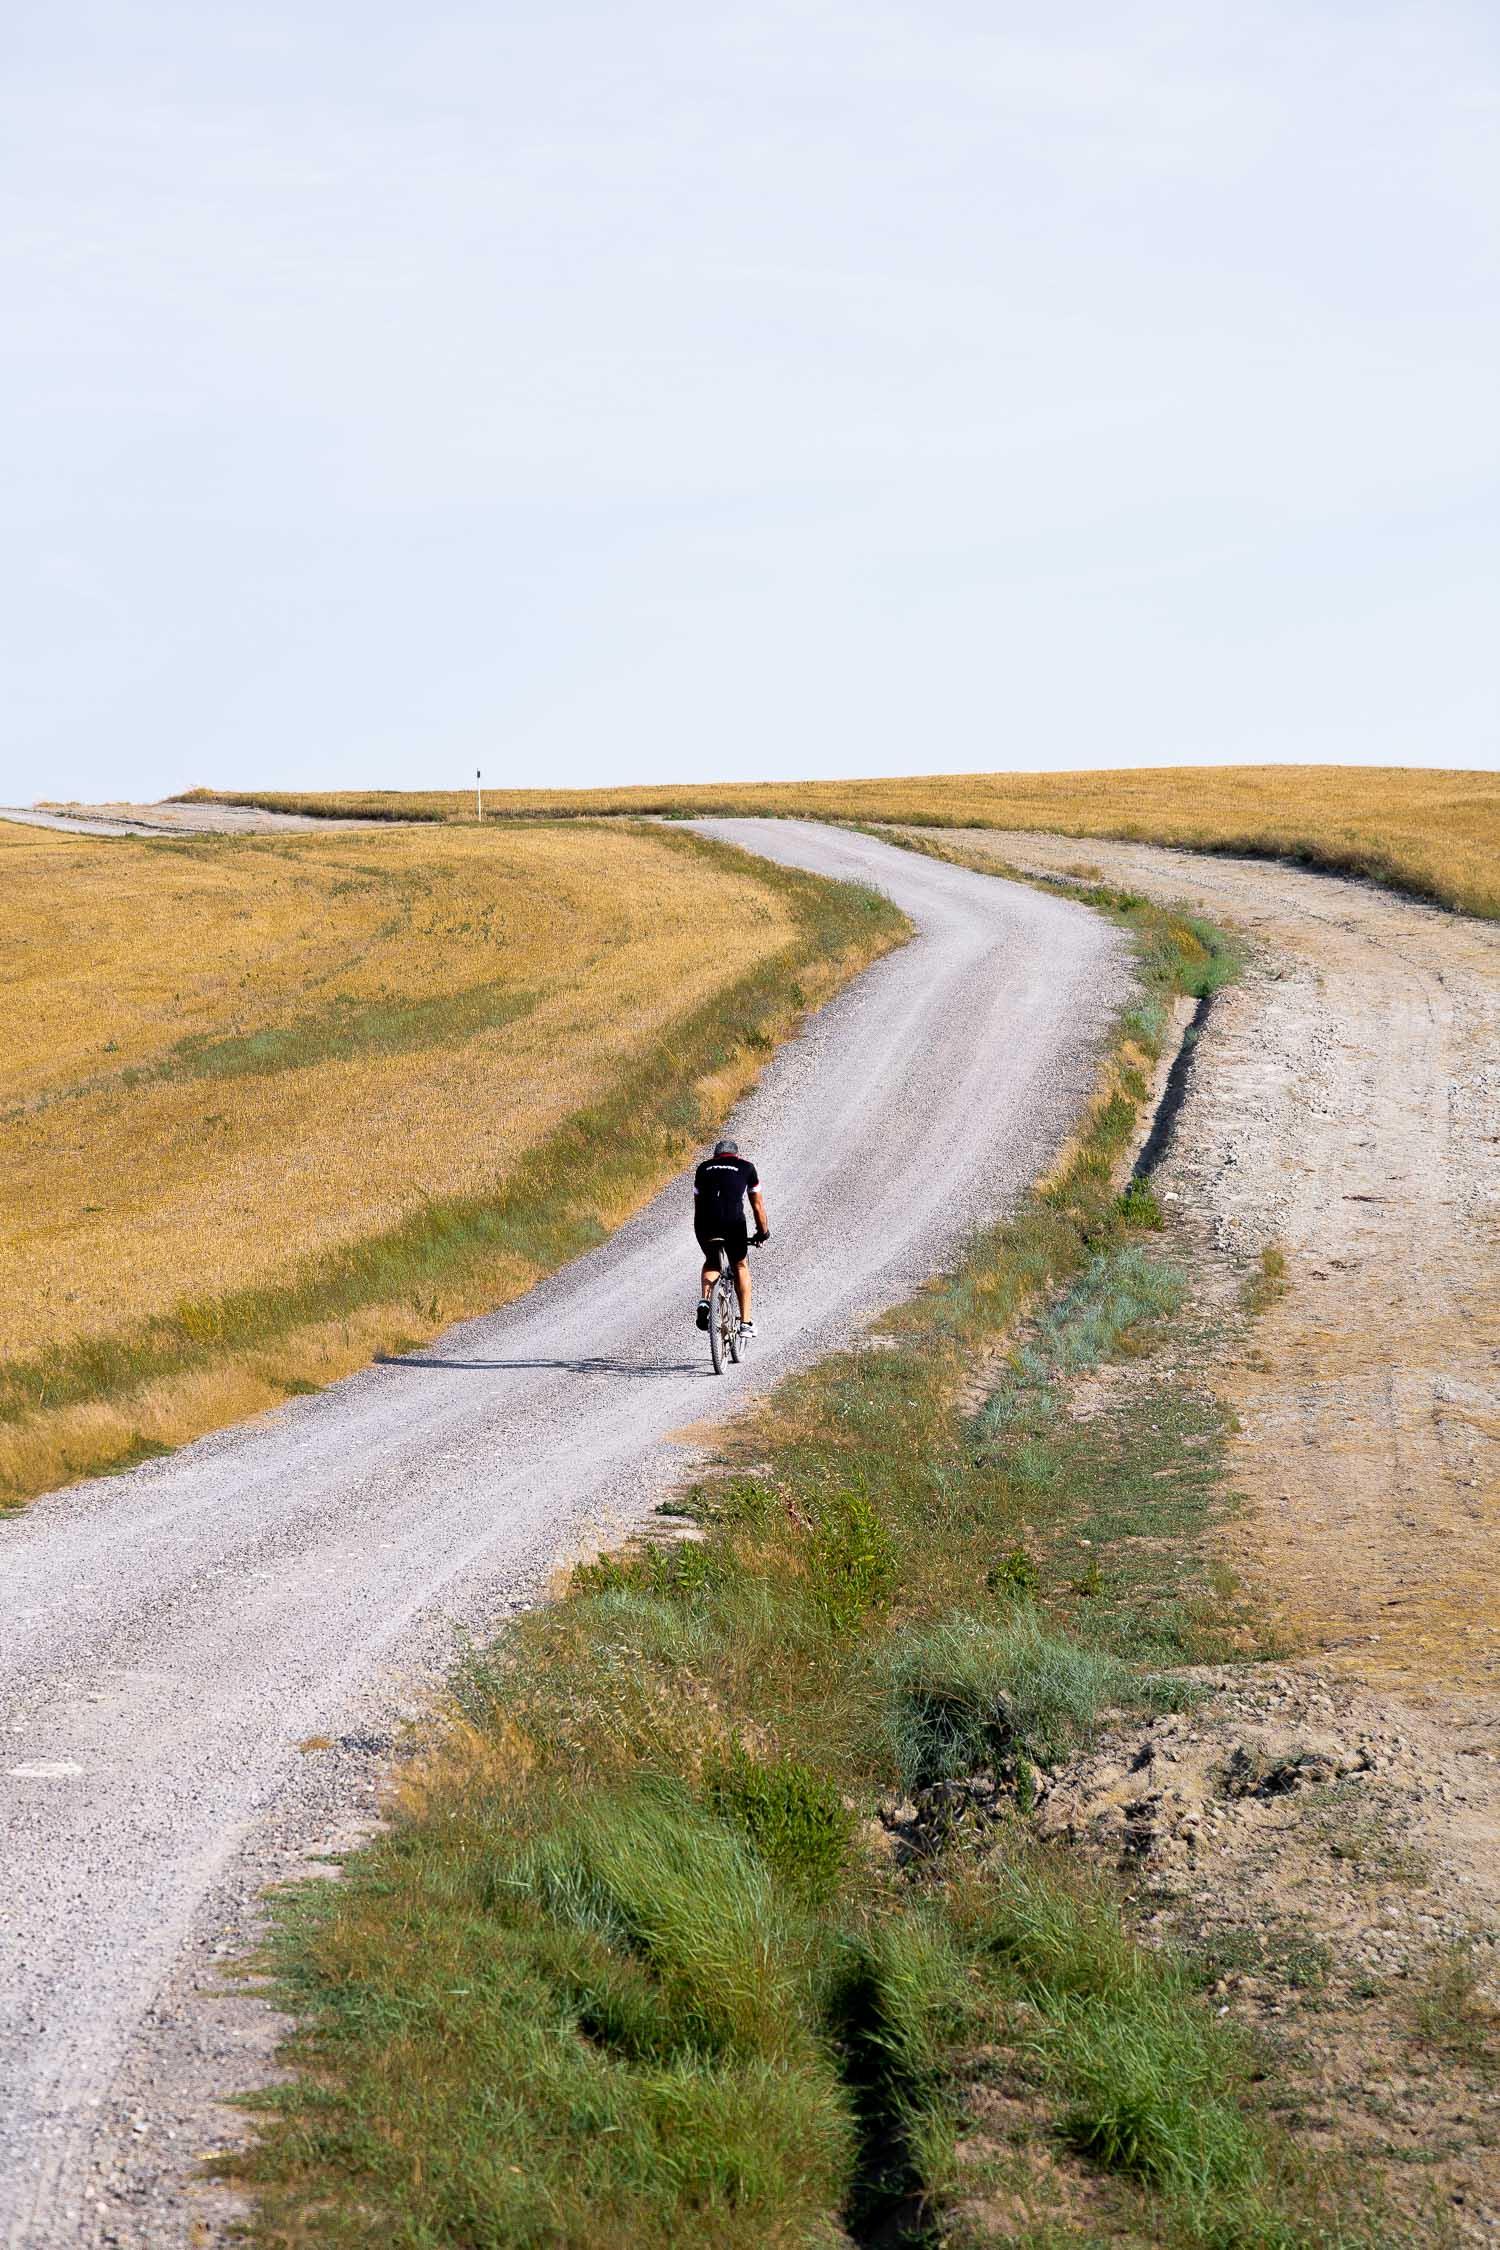 Tuscany-biker-5292.jpg